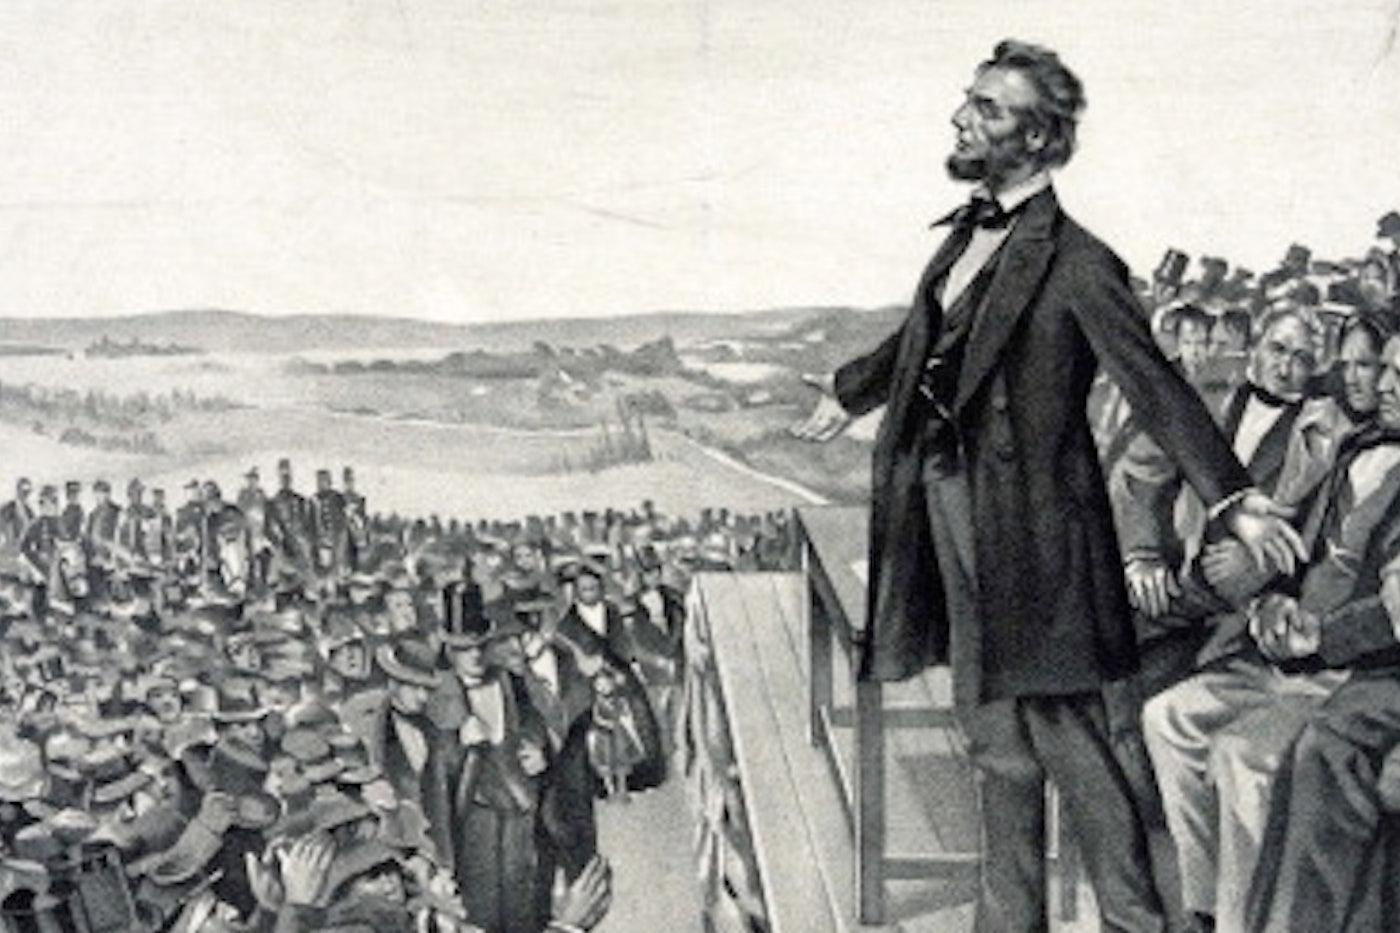 Gettysburg Addres 150th Anniversary Sean Wilentz On Abraham Lincoln The New Republic Paraphrased Sentences